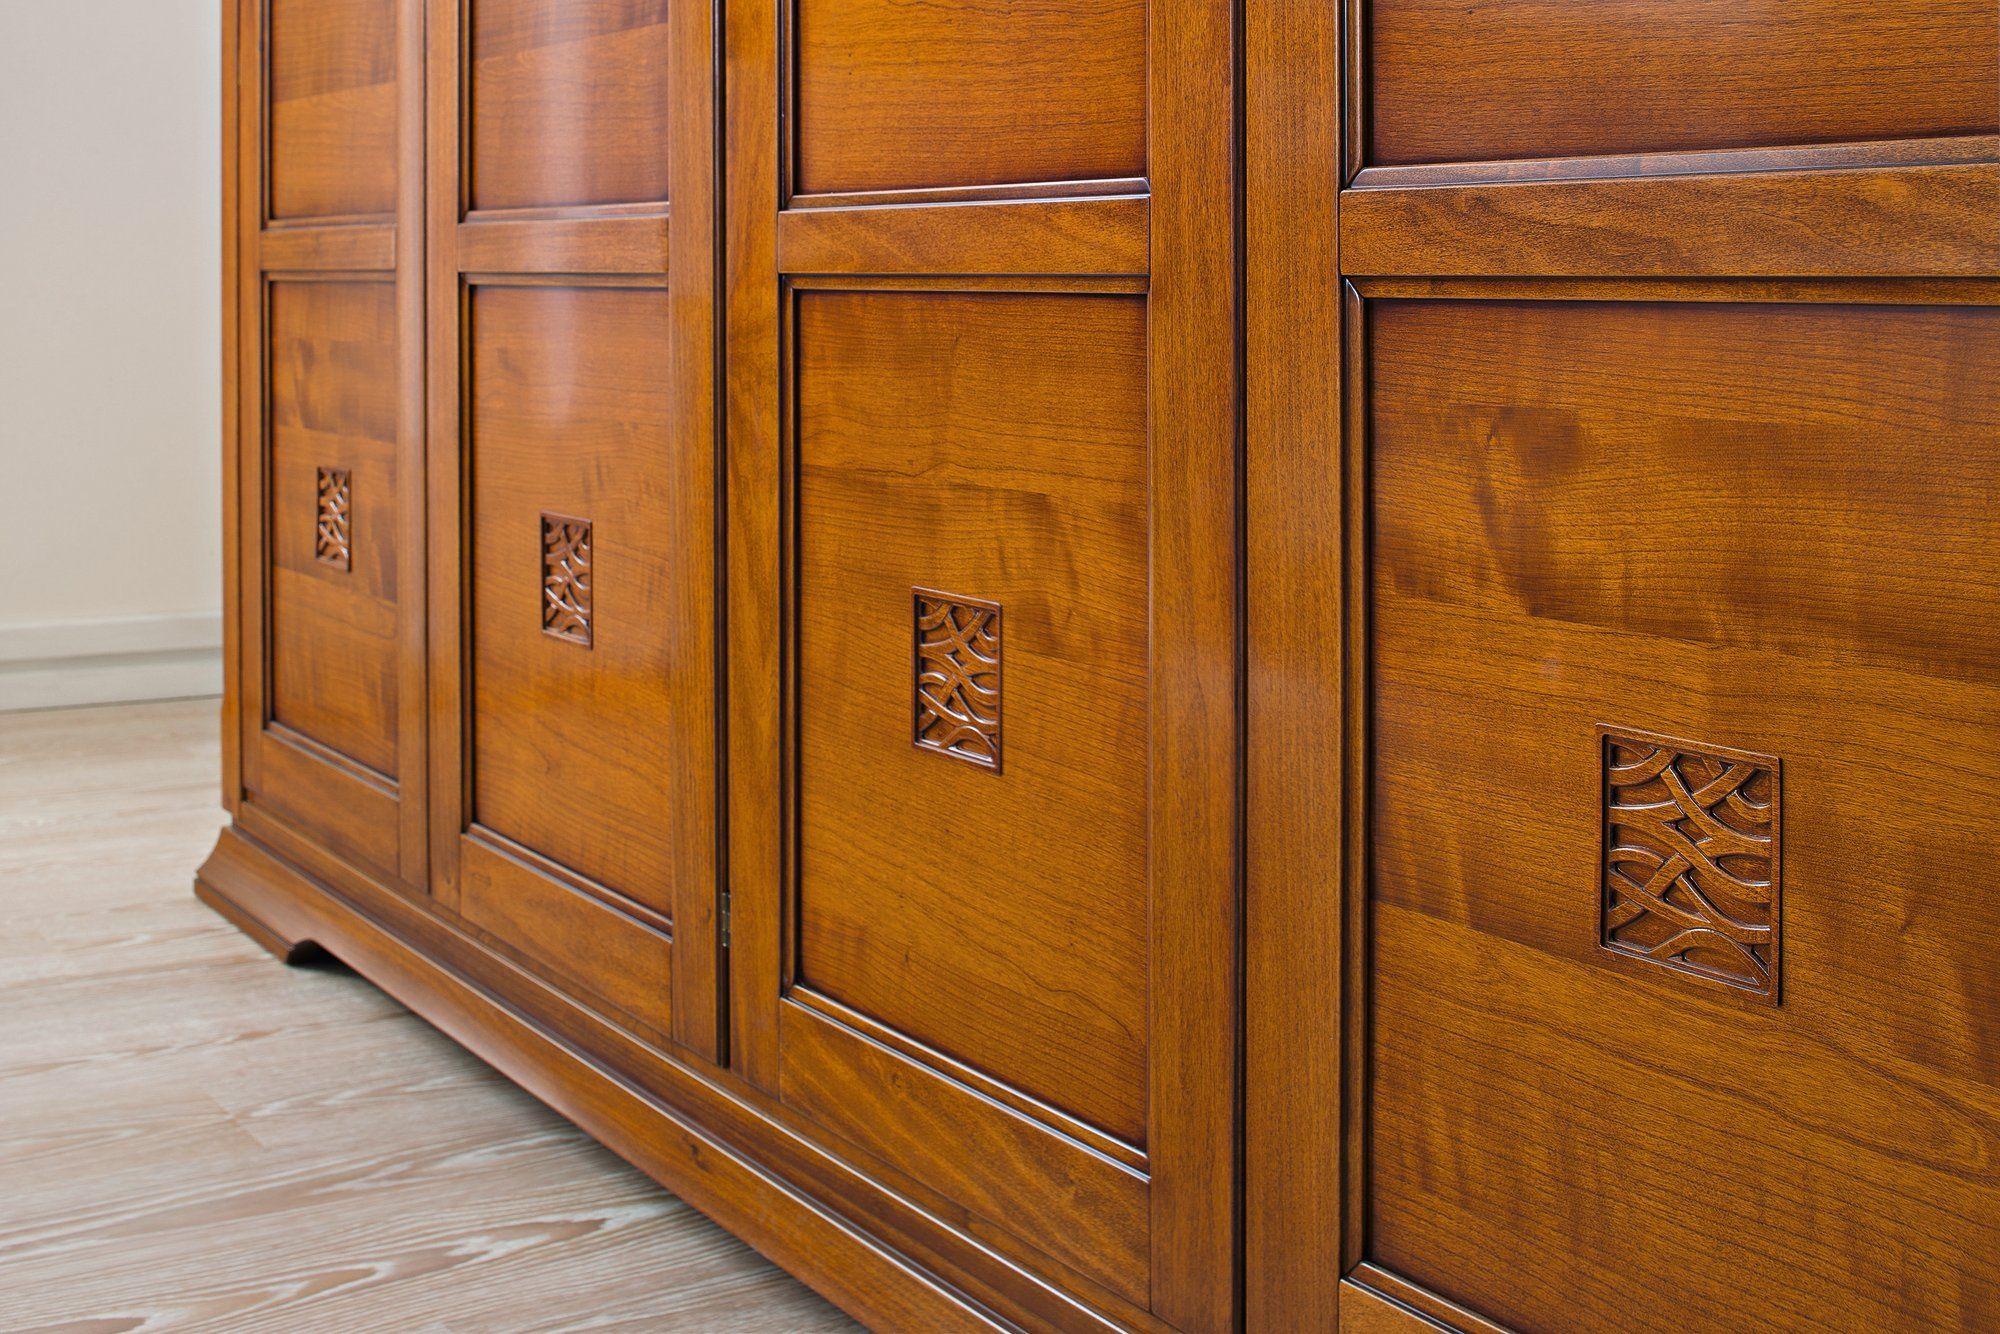 Camerette ponte 280 cm - Dall agnese mobili classici ...